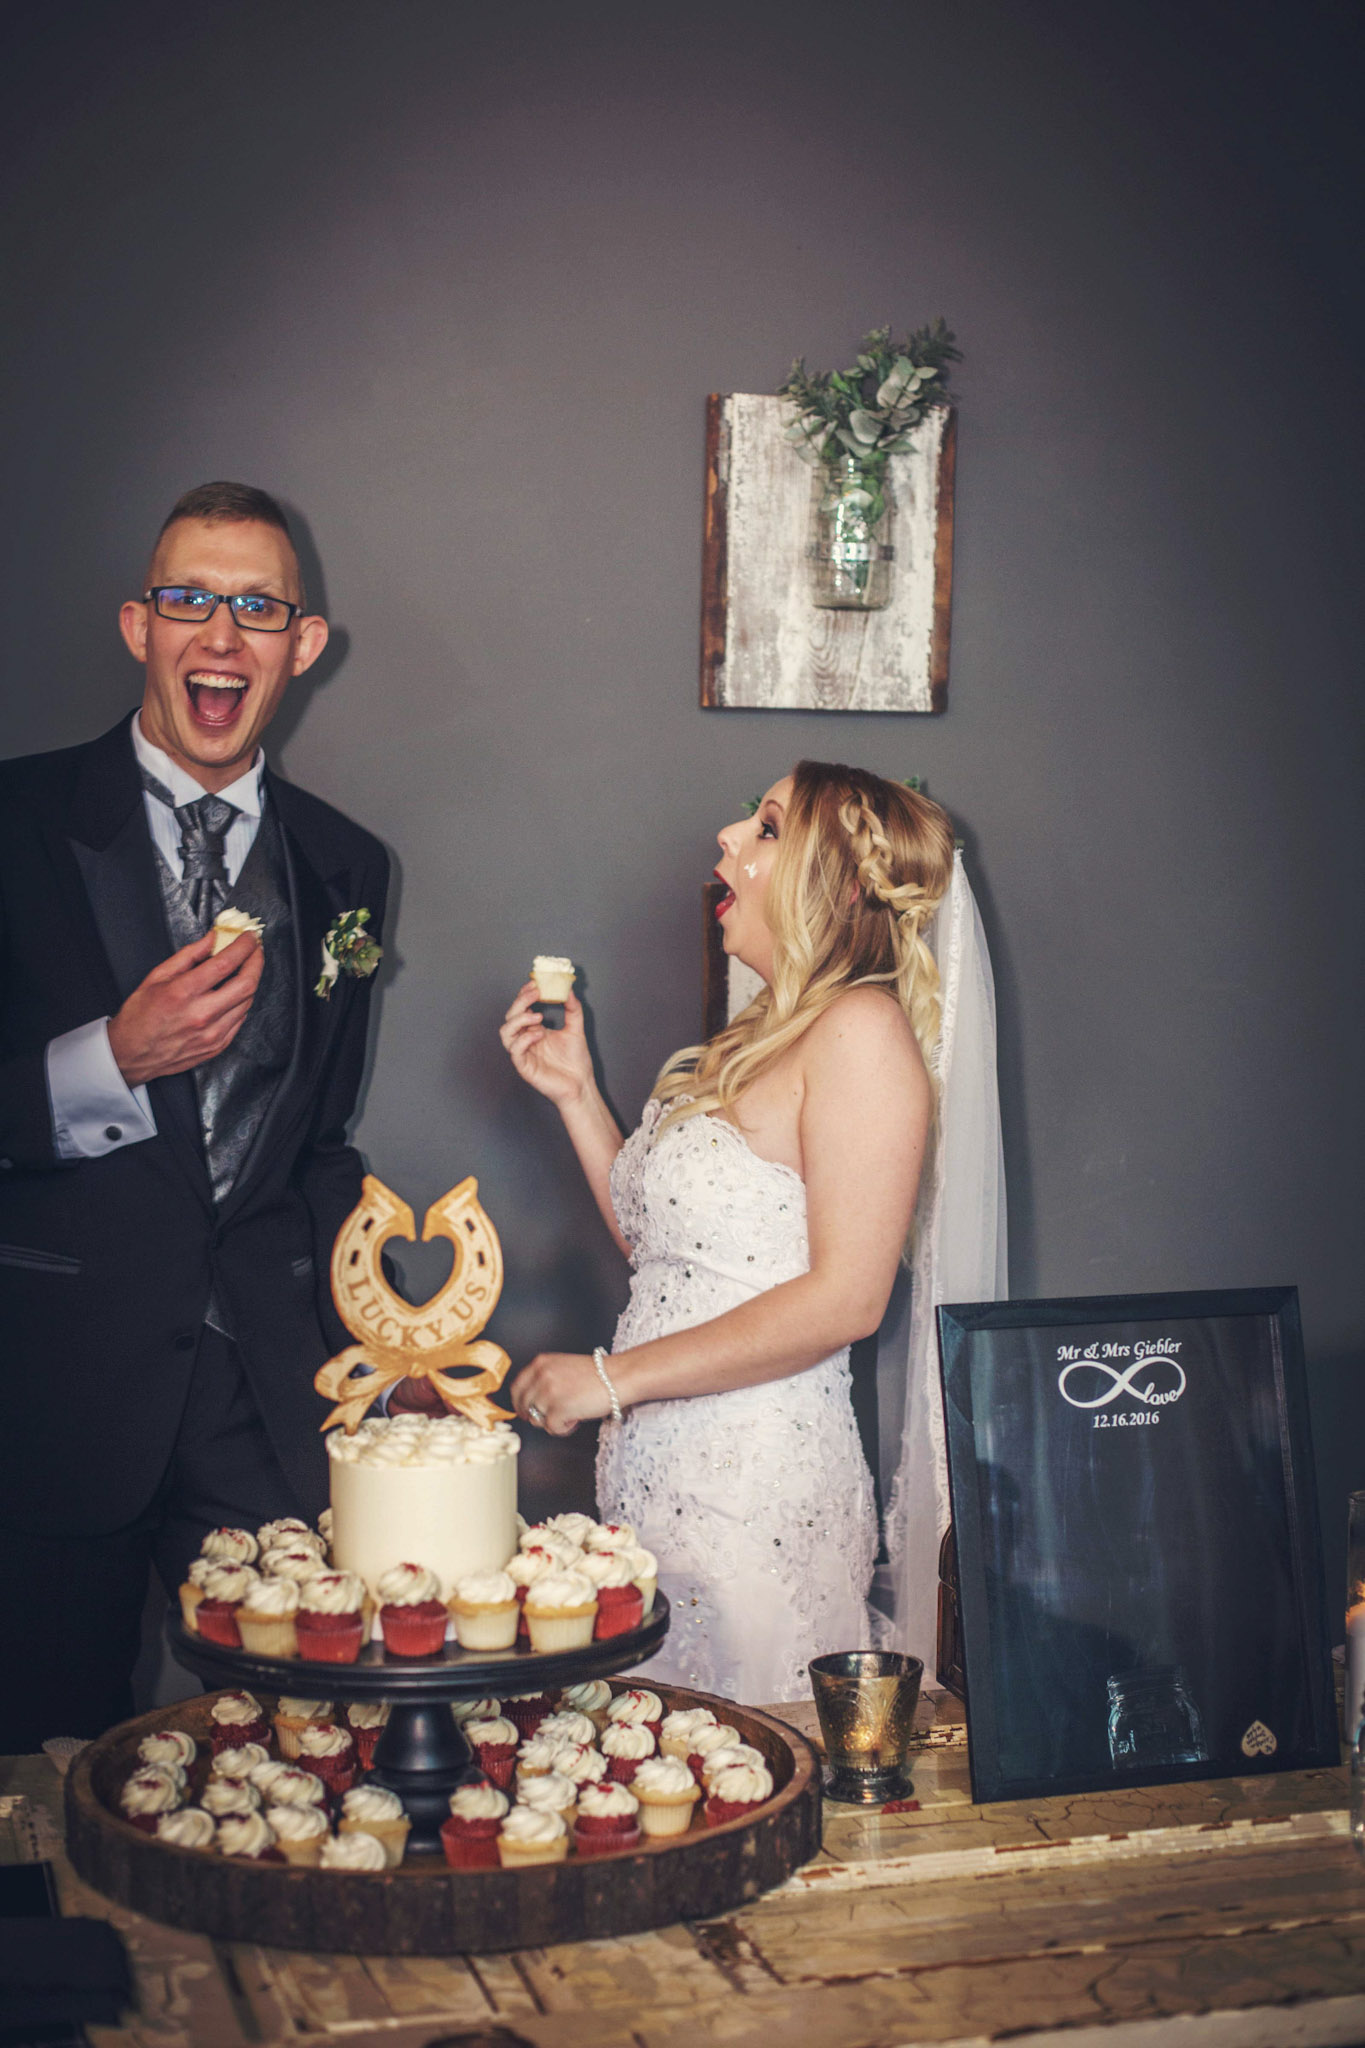 Kansas_City_Small_Intimate_Budget_Wedding_Venue_Maranda&Neal-061b.jpg